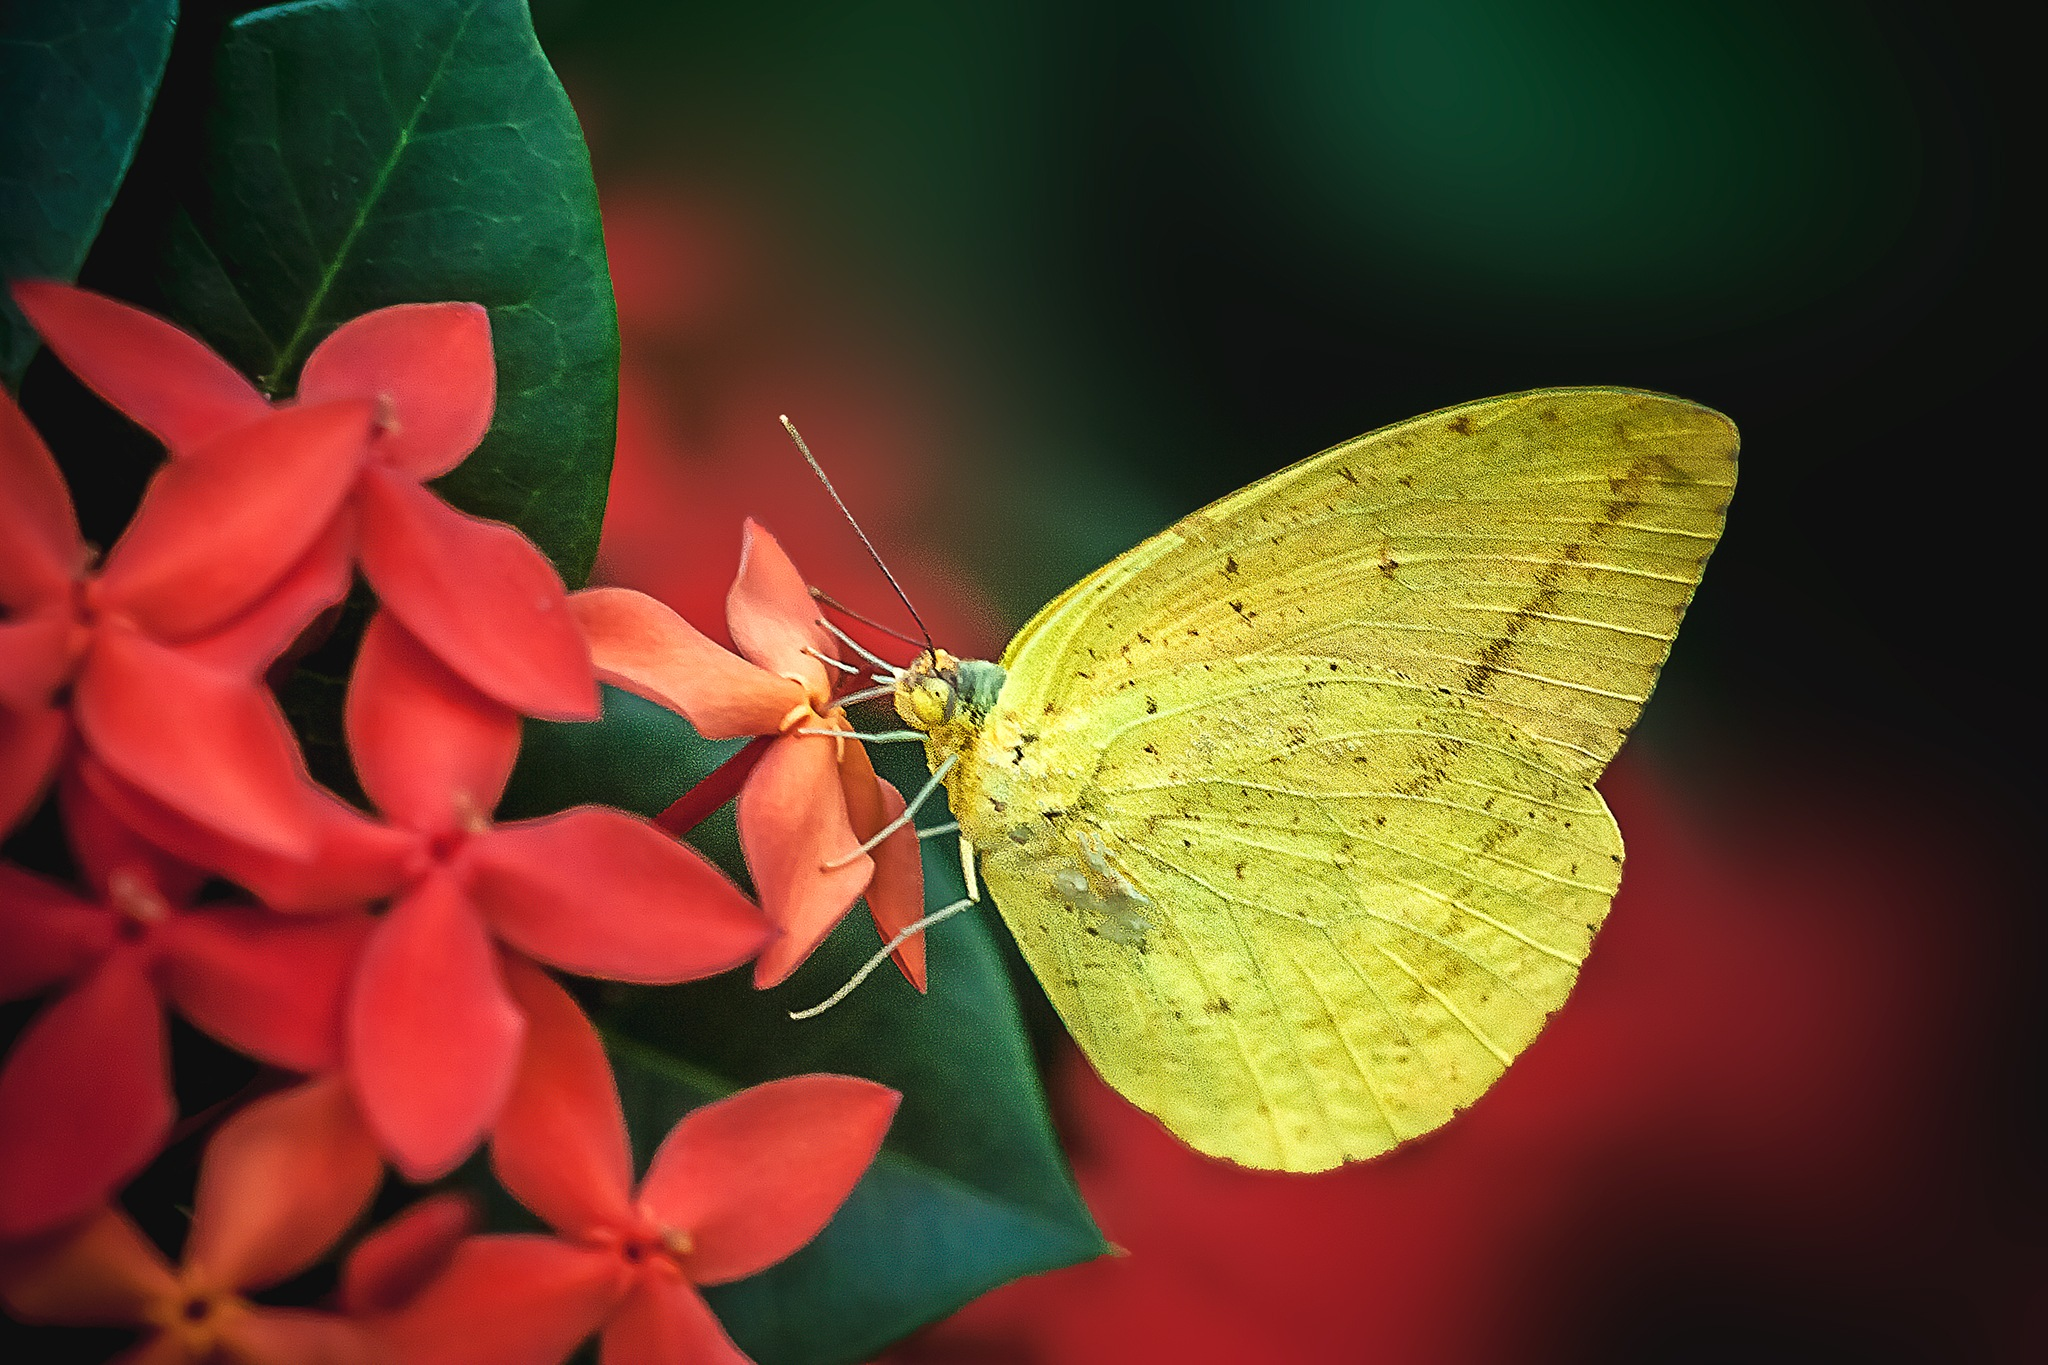 Butterfly 202-001 - Pyrisitia leuce mimulus by Tony Guzman